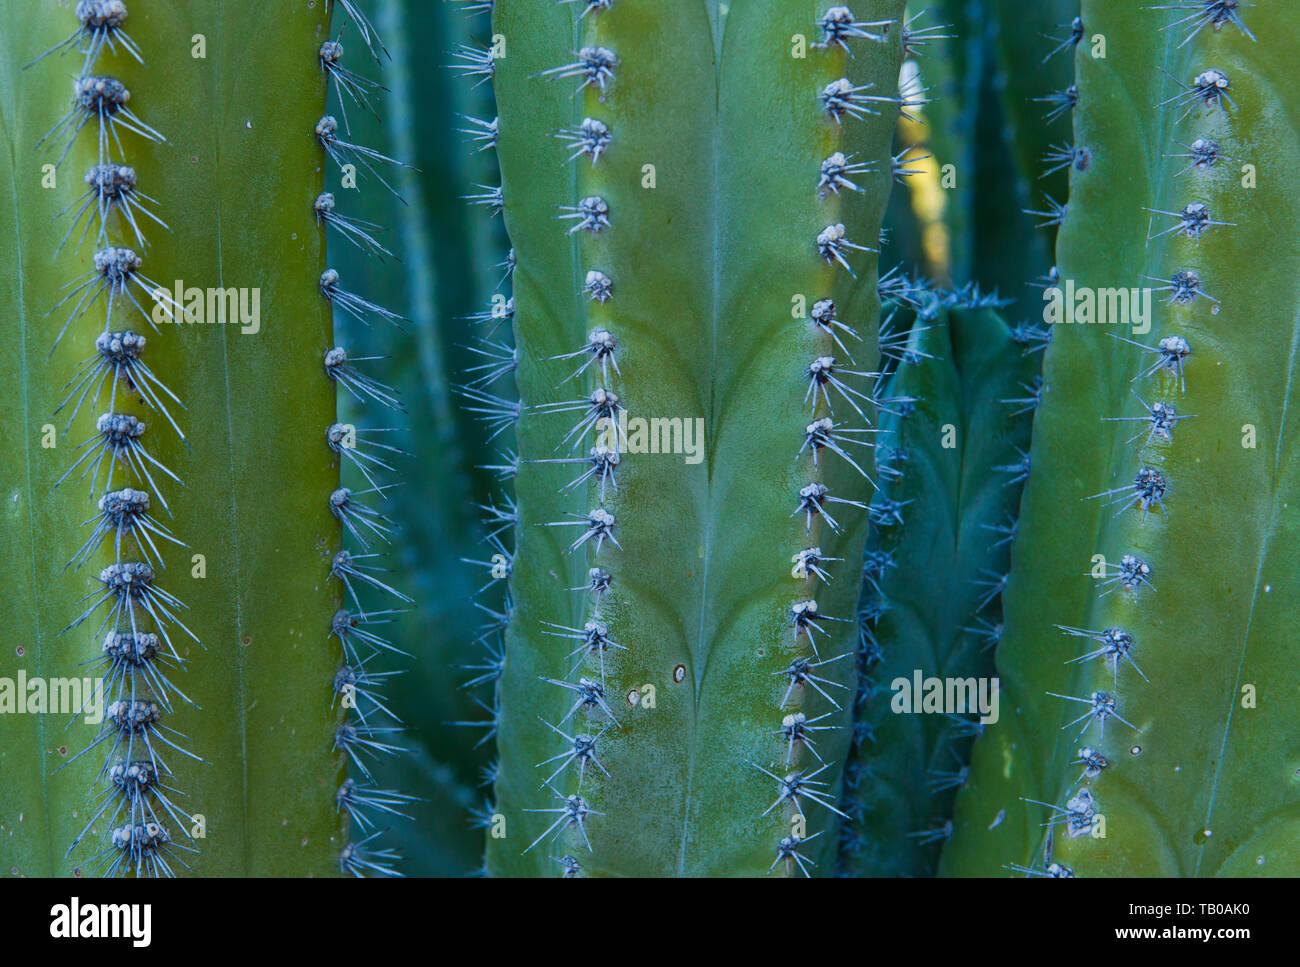 Cactus bei Phoenix Desert Botanical Gardens, Phoenix, Arizona, USA. Stockbild